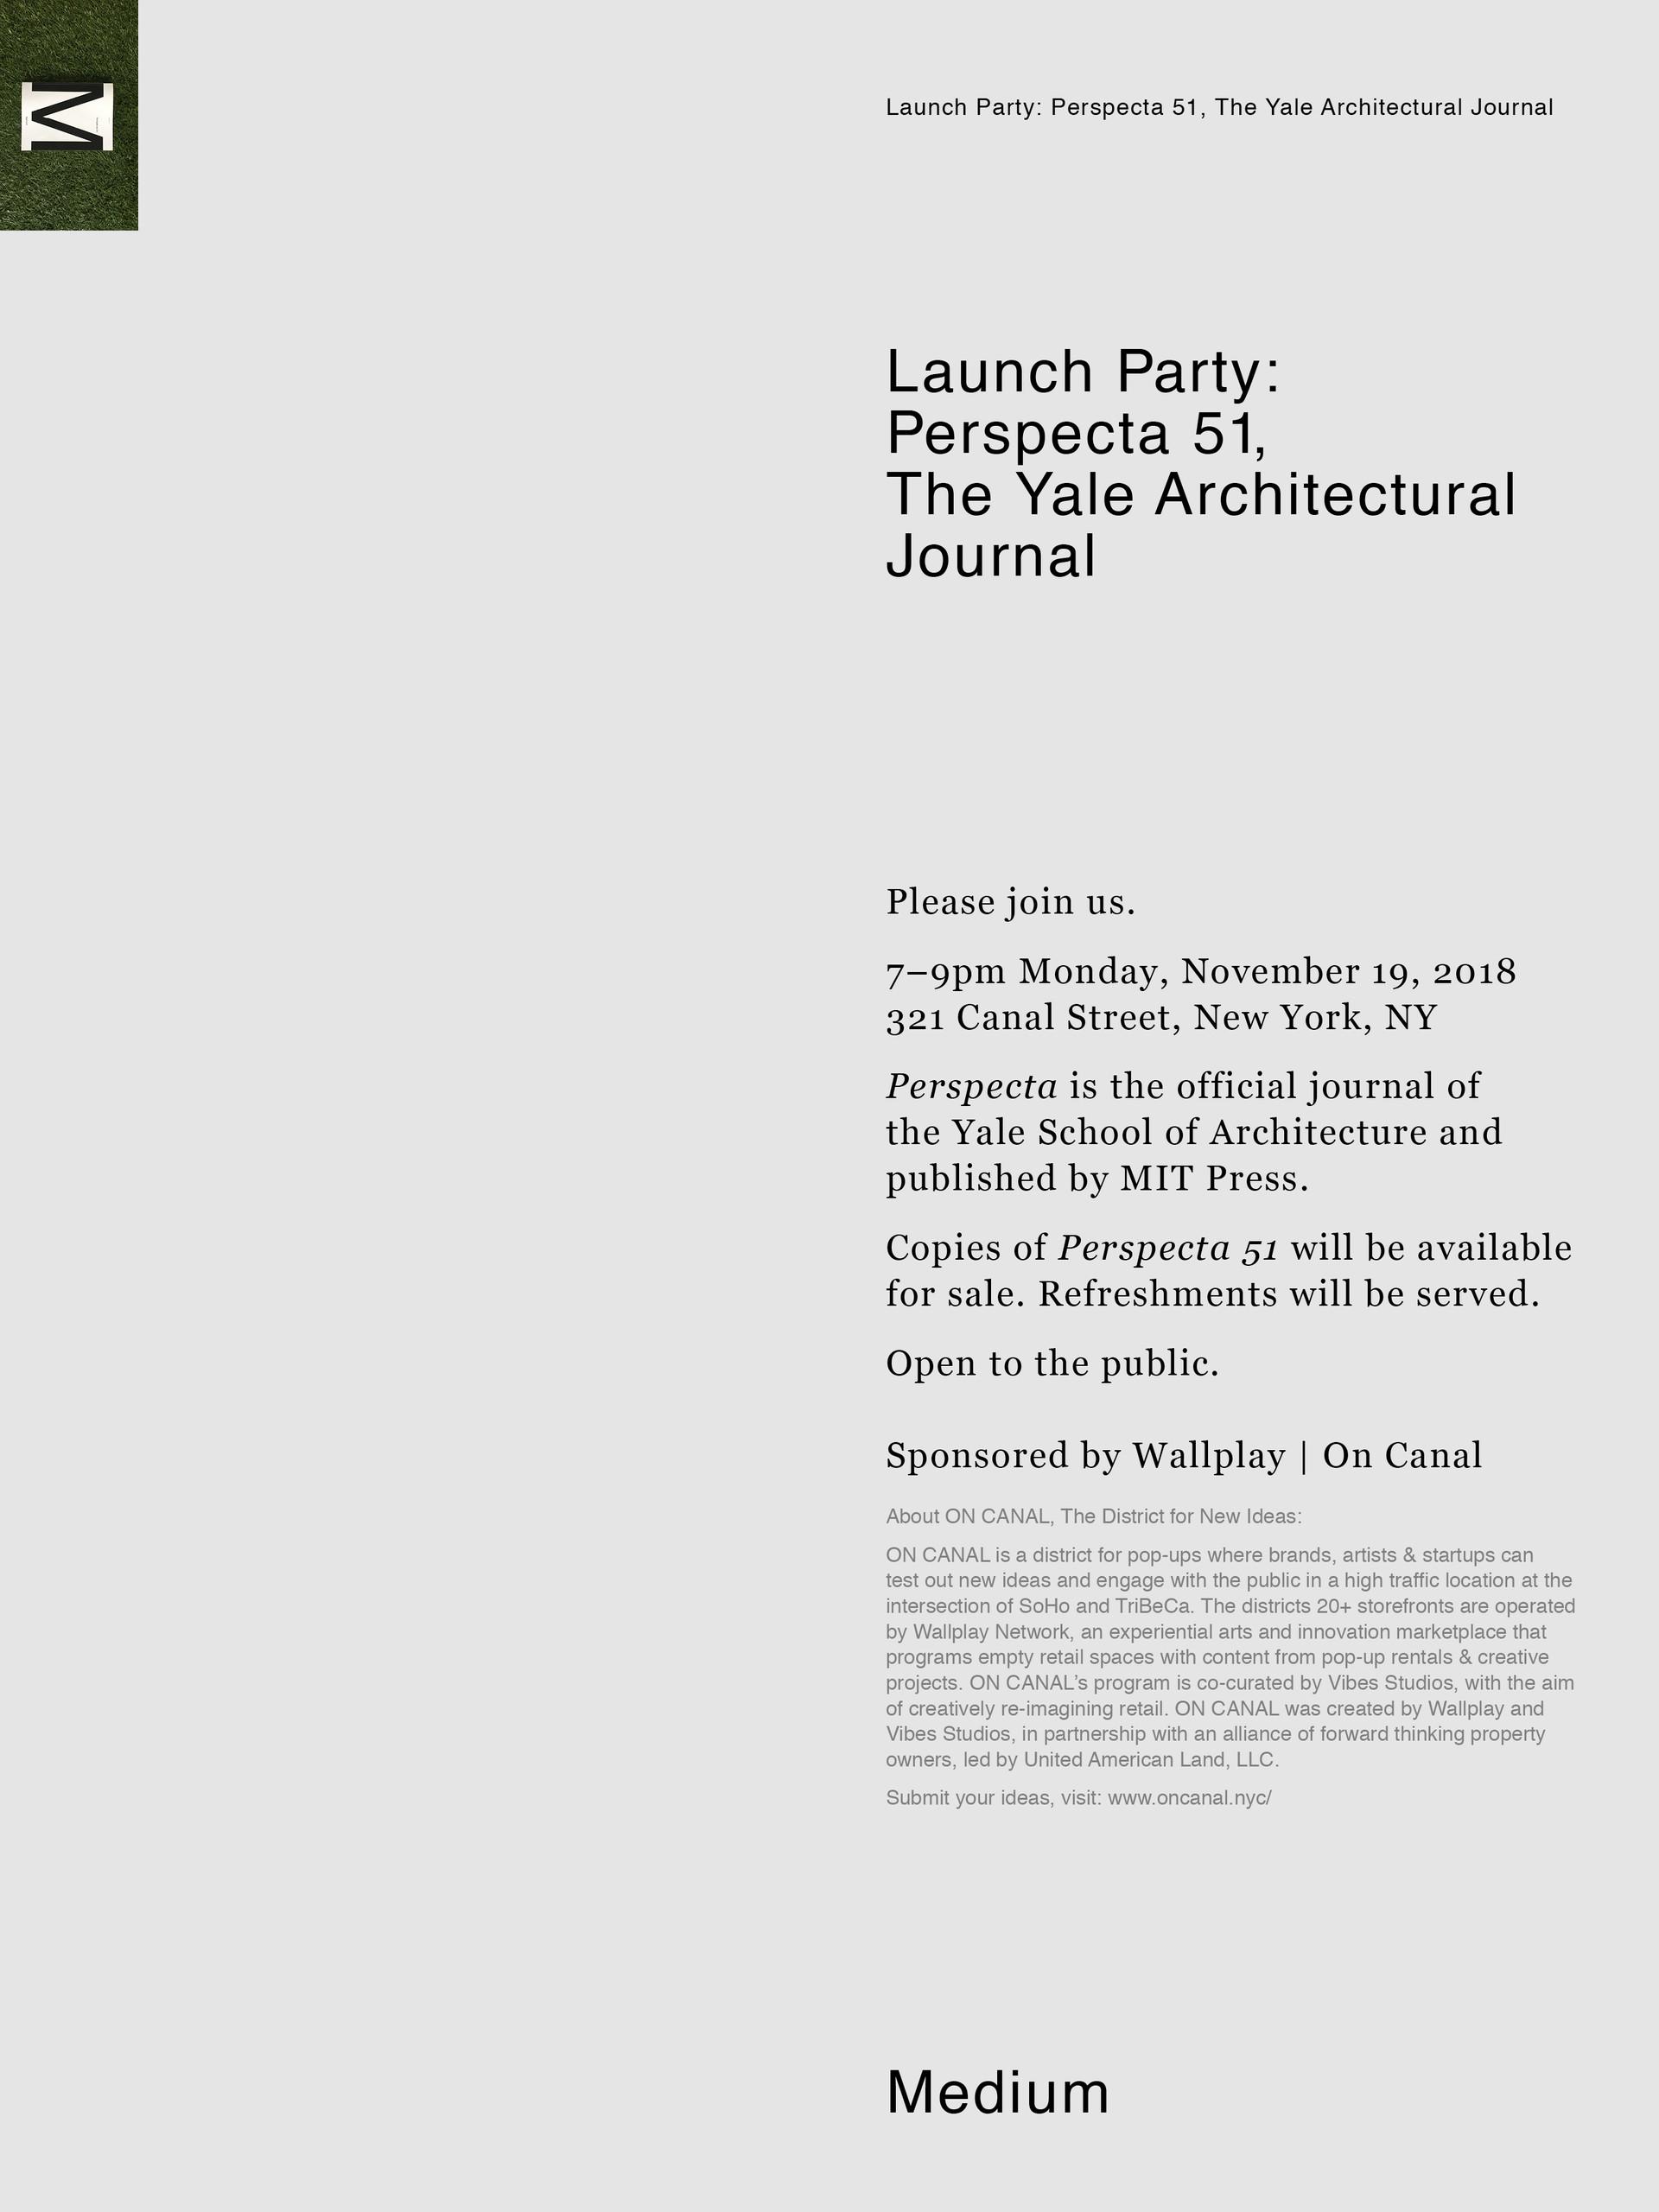 p51_INVITATION.jpg